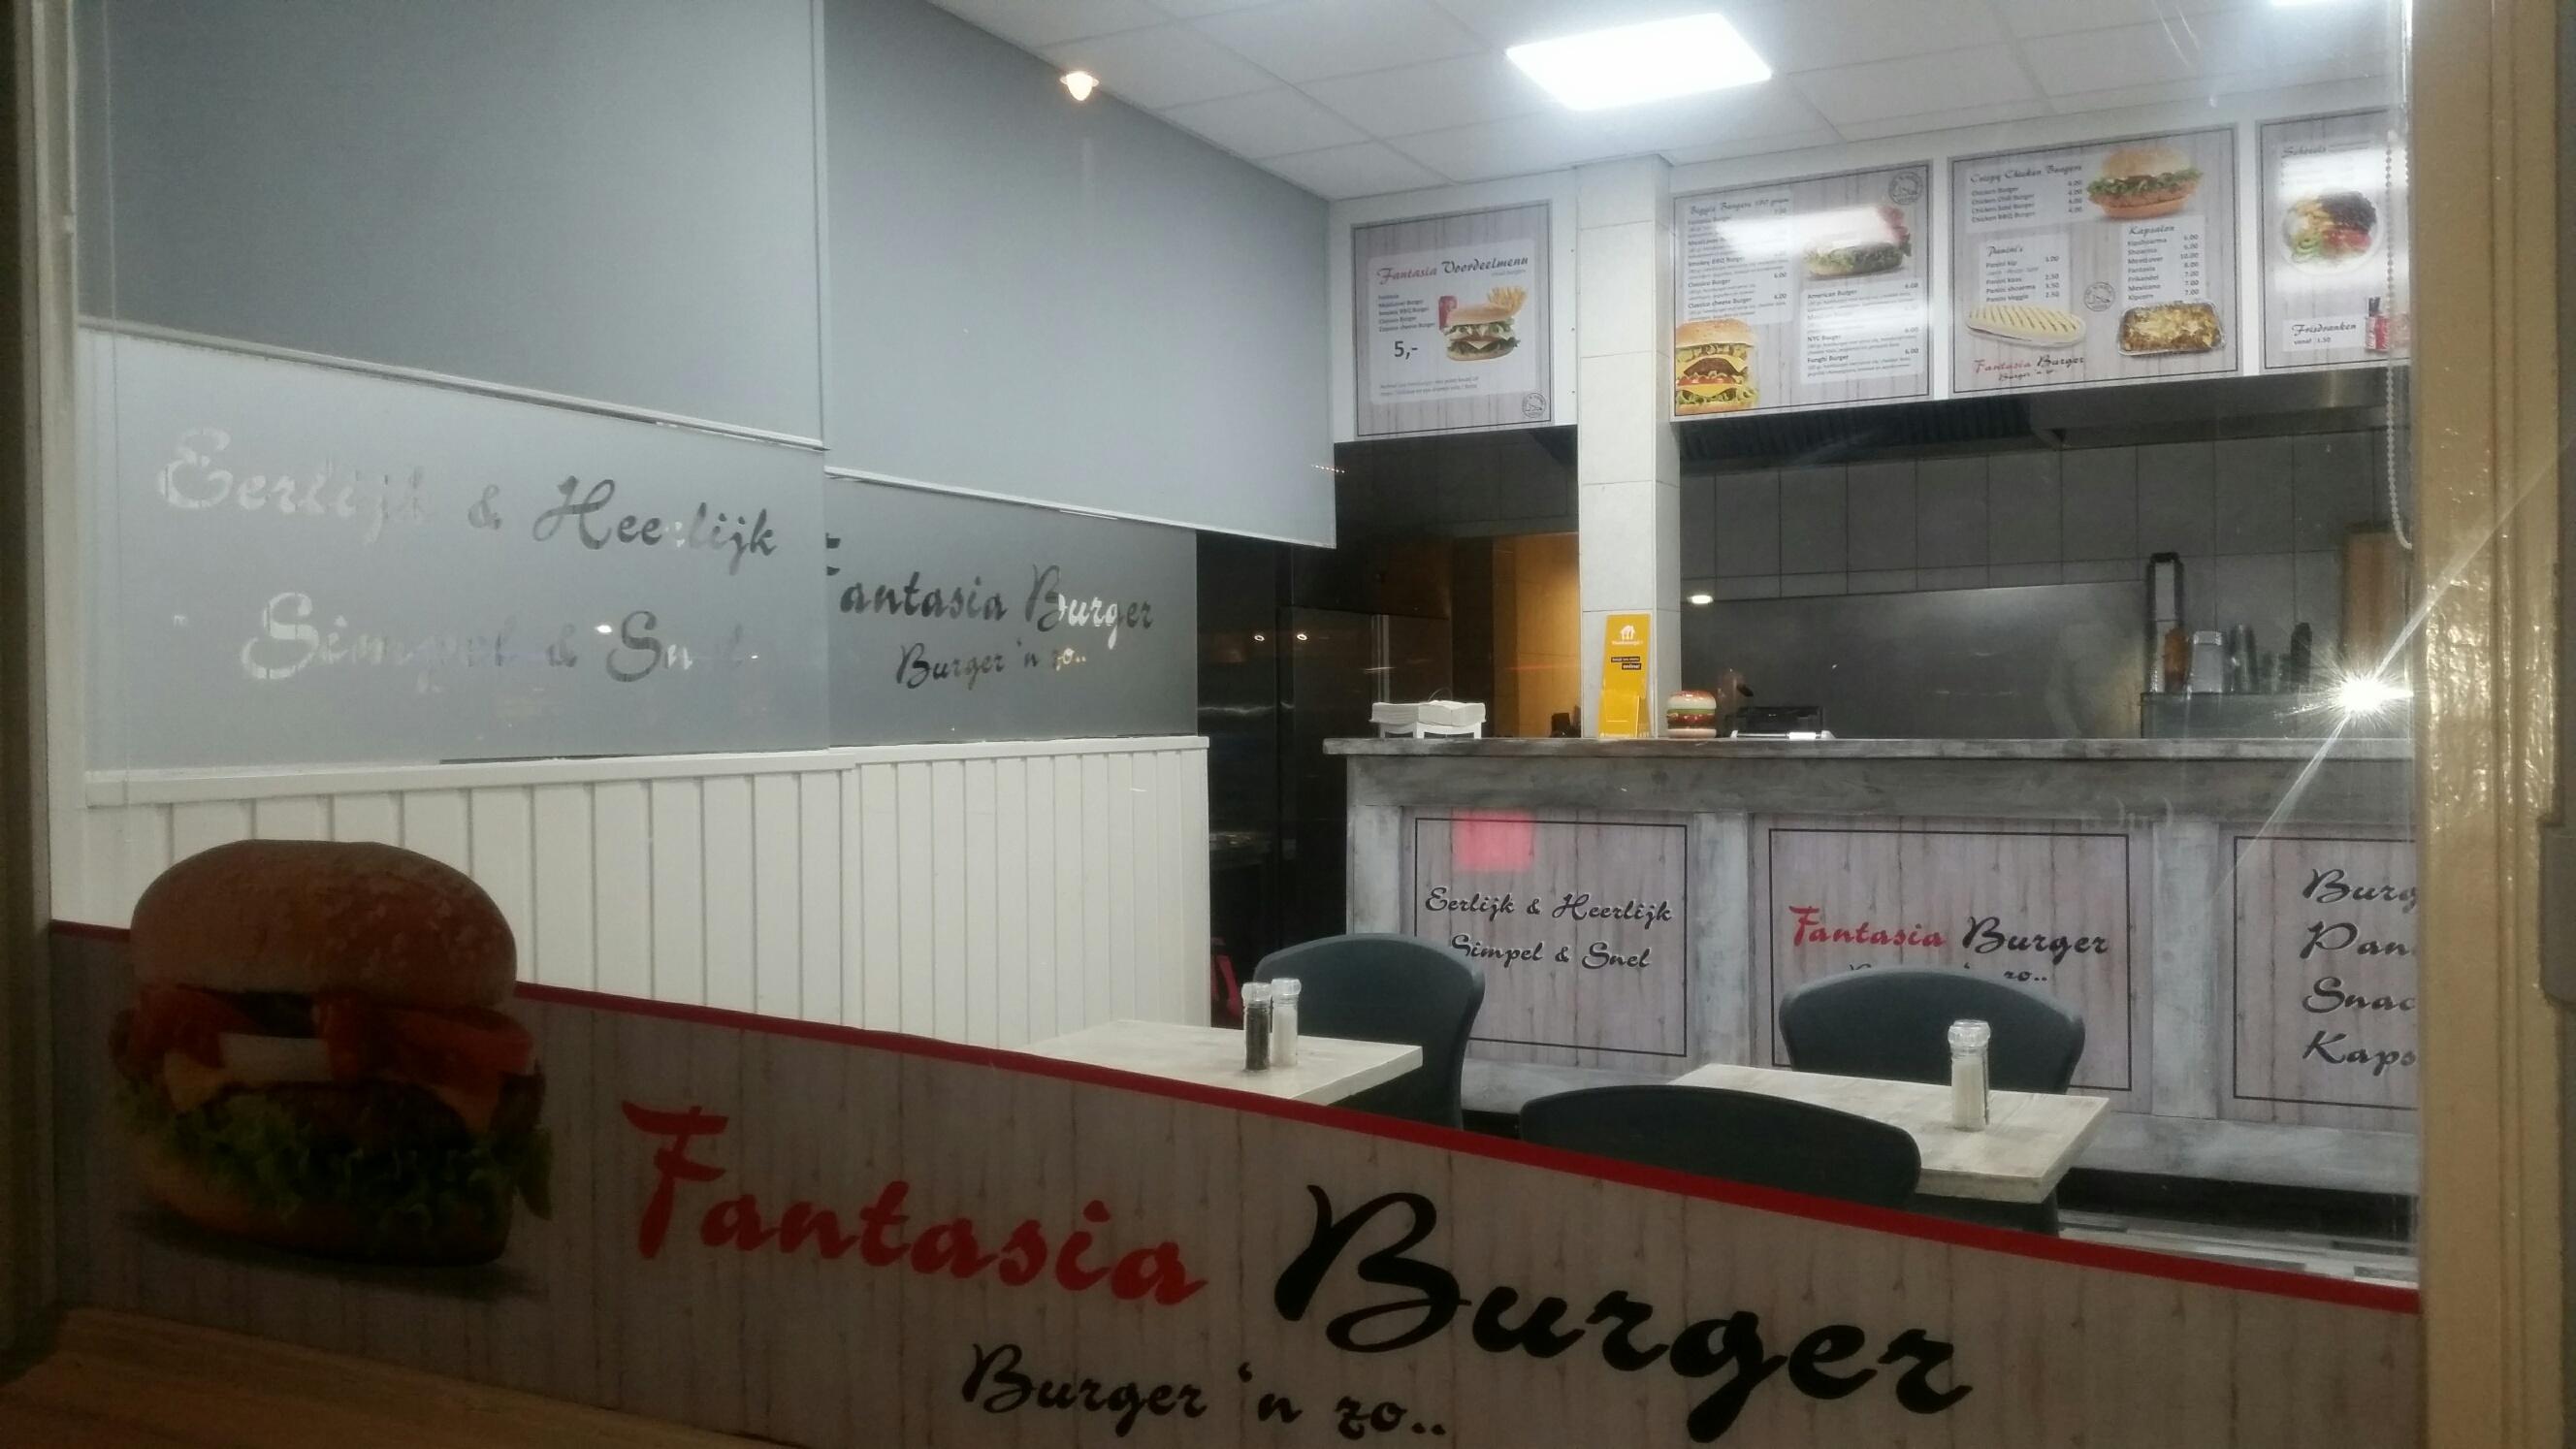 Interieur Fantasia Burger Amsterdam